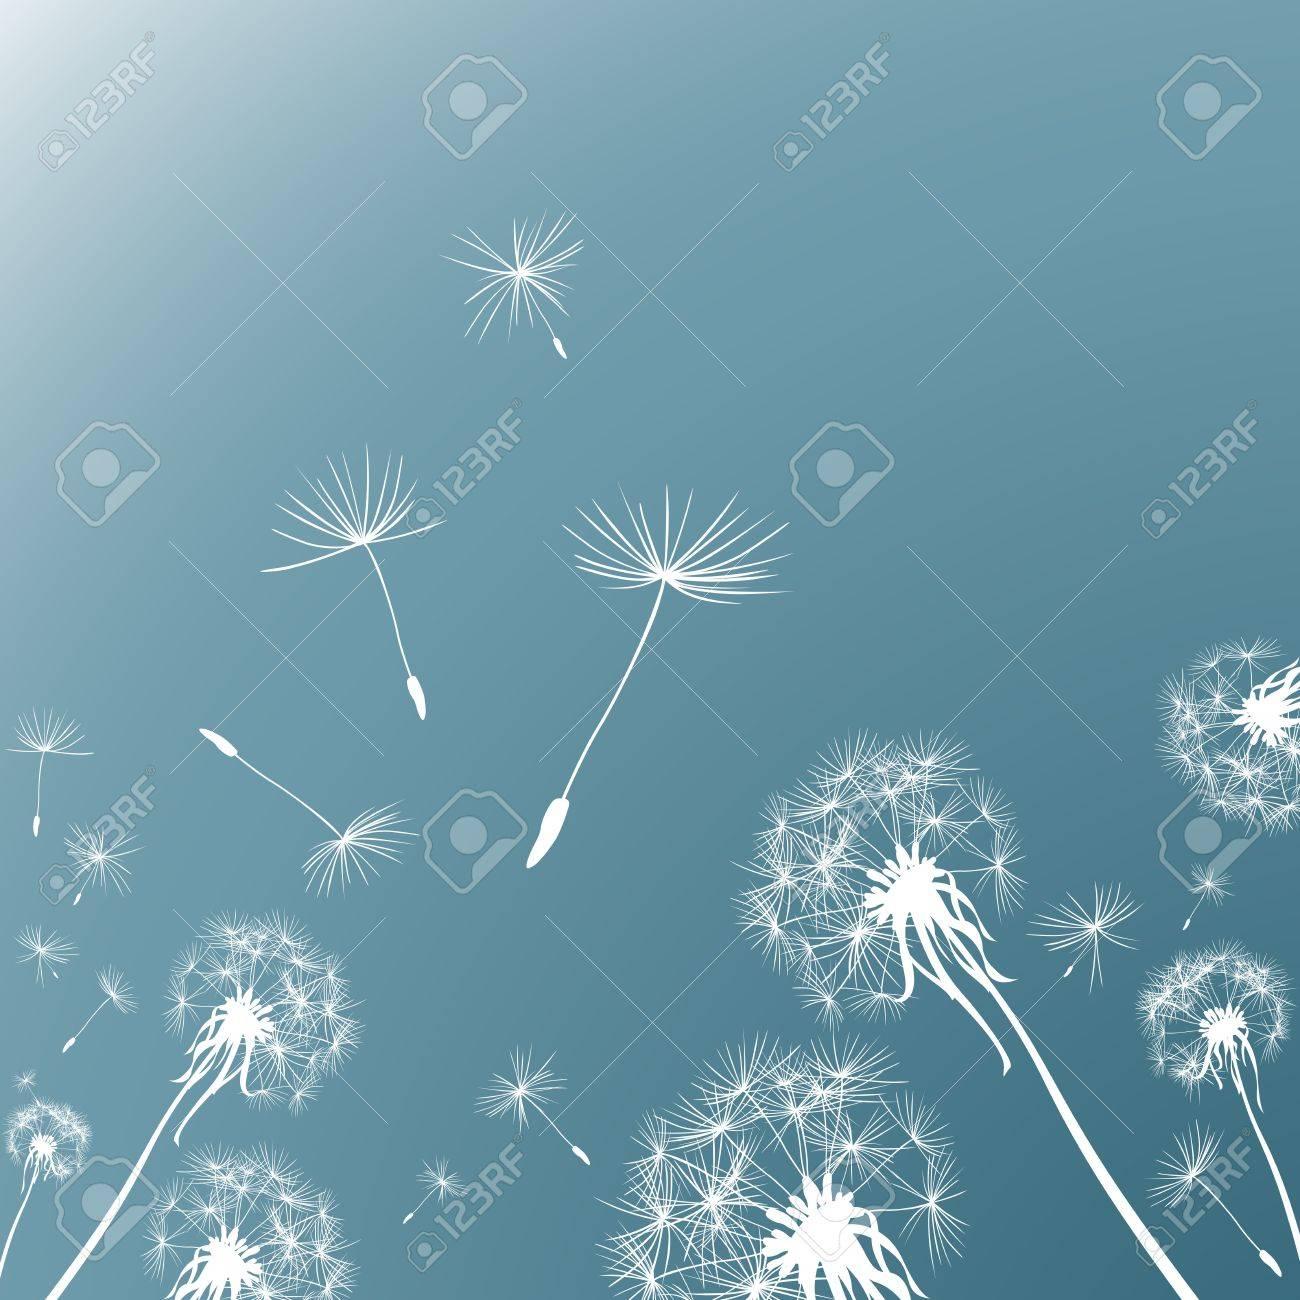 dandelions in the wind - 17476494